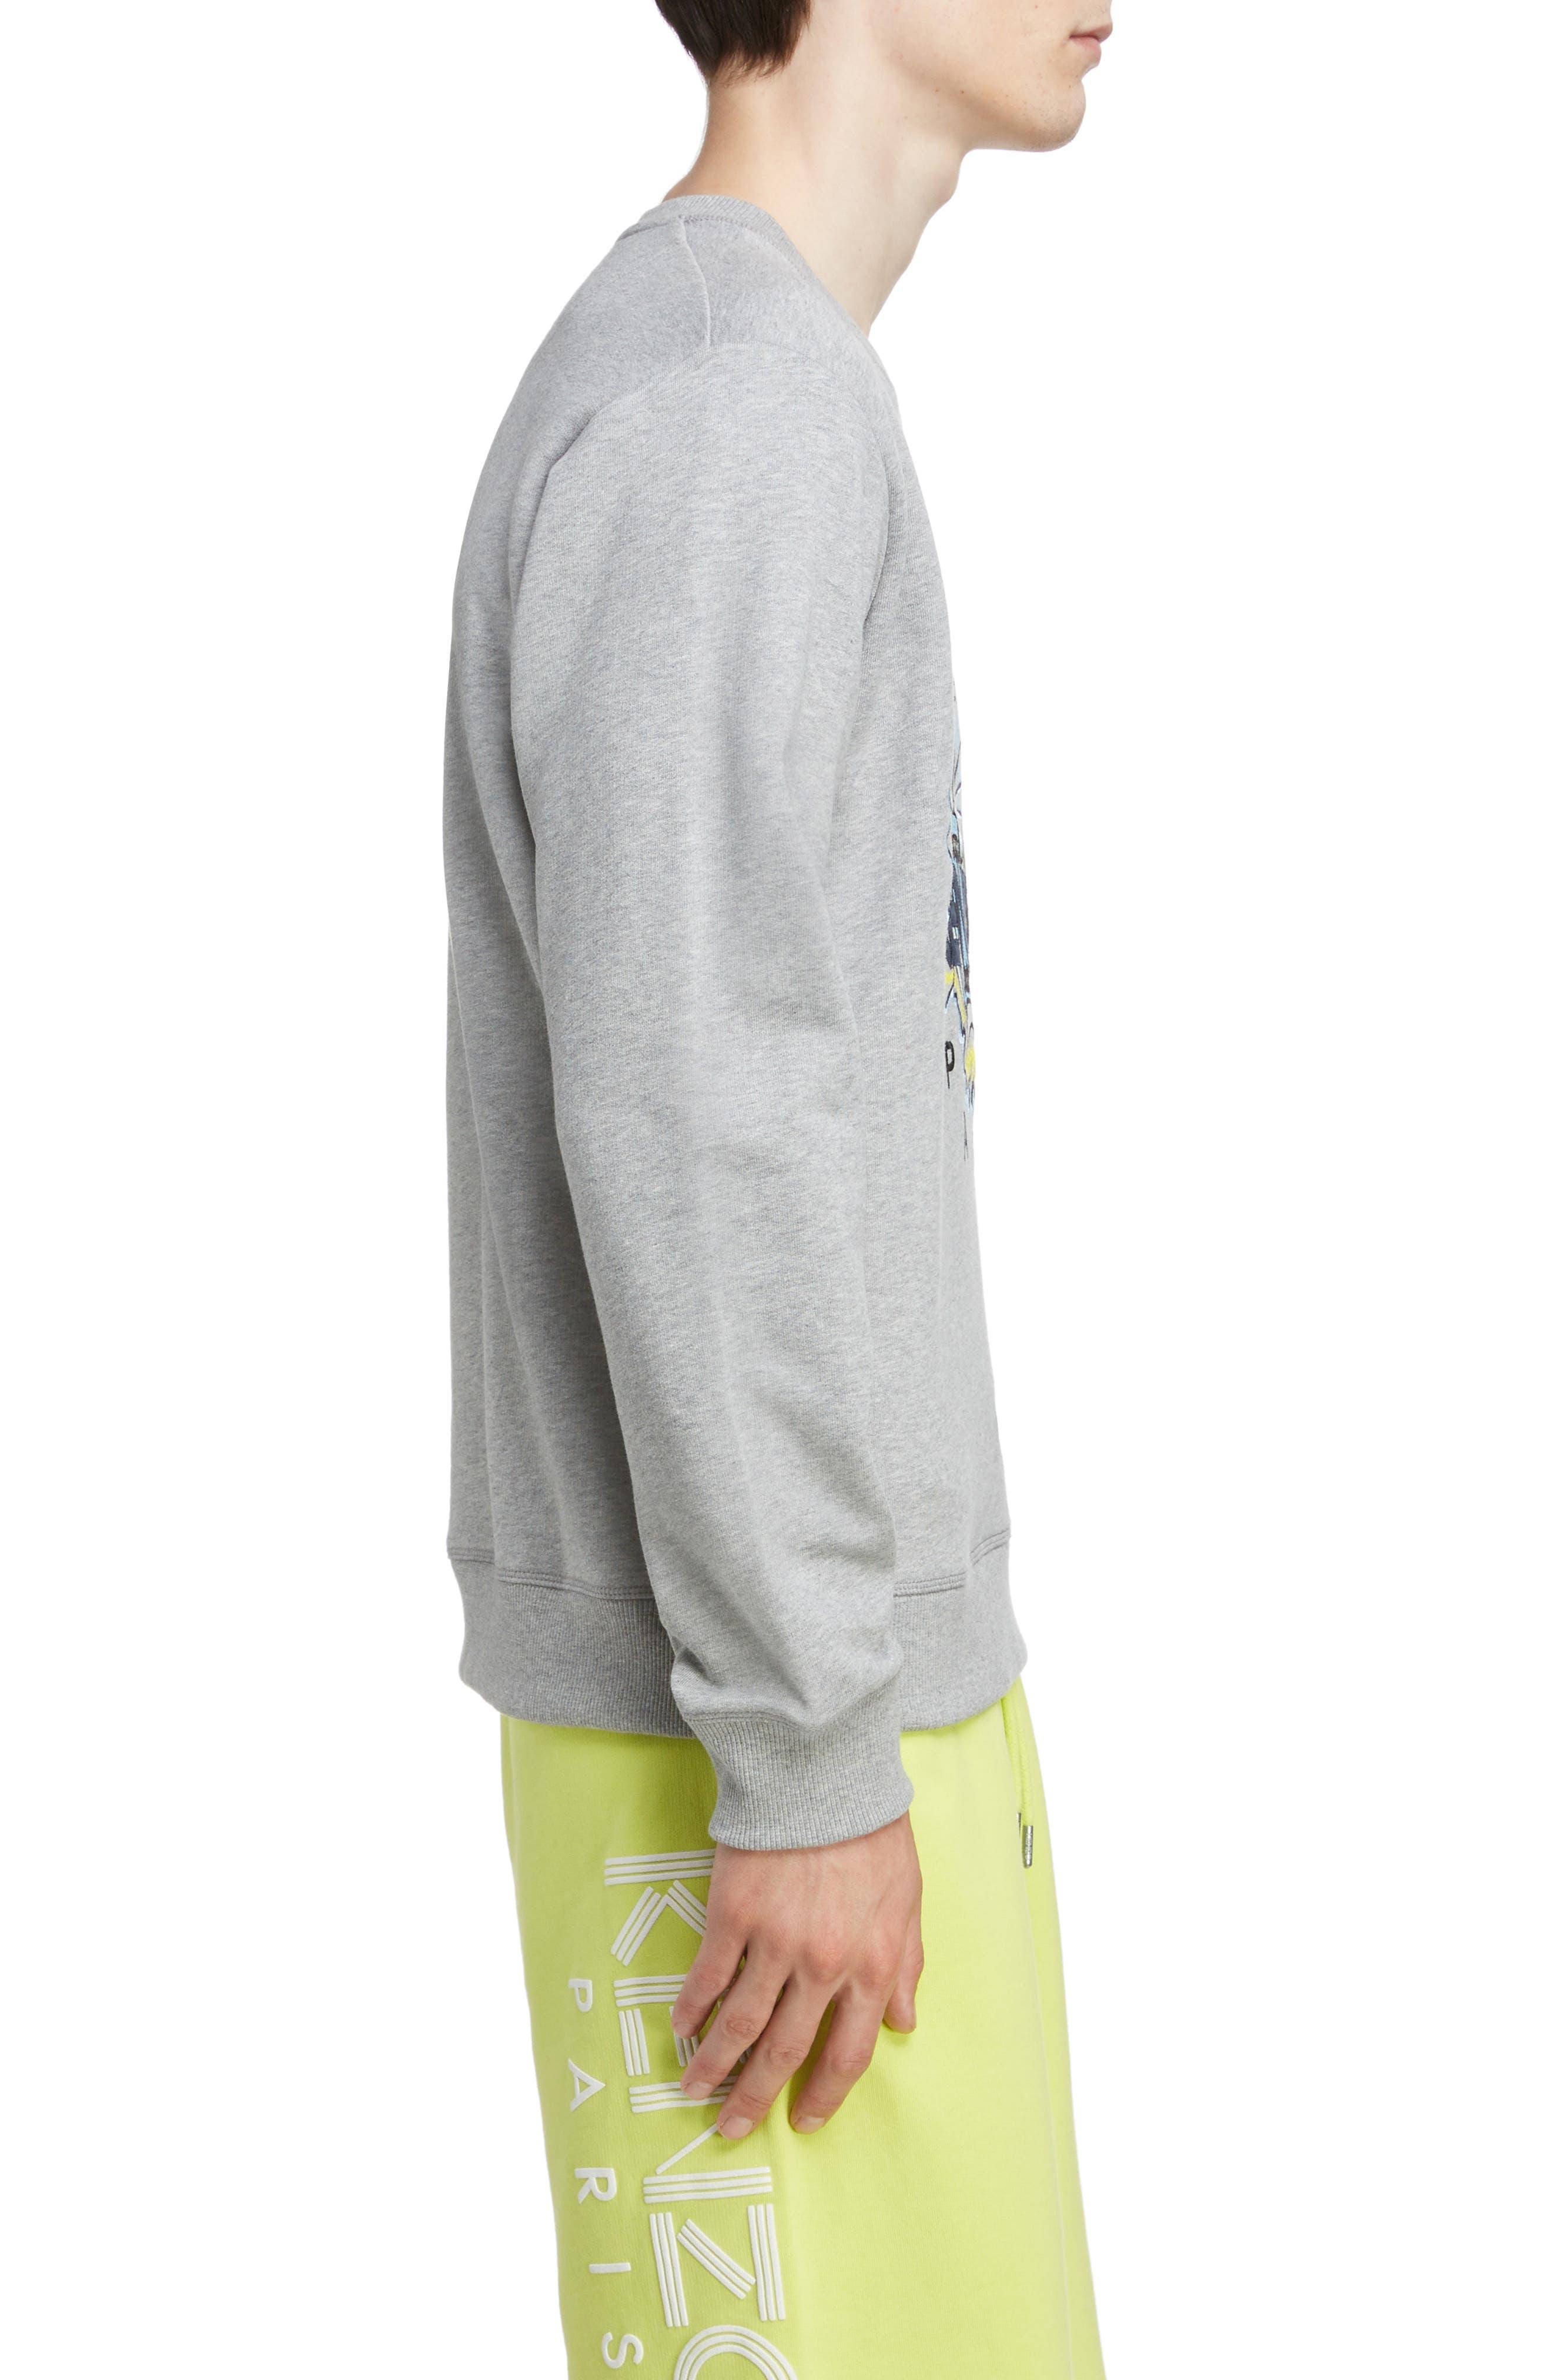 KENZO, Tiger Sweatshirt, Alternate thumbnail 3, color, PEARL GREY